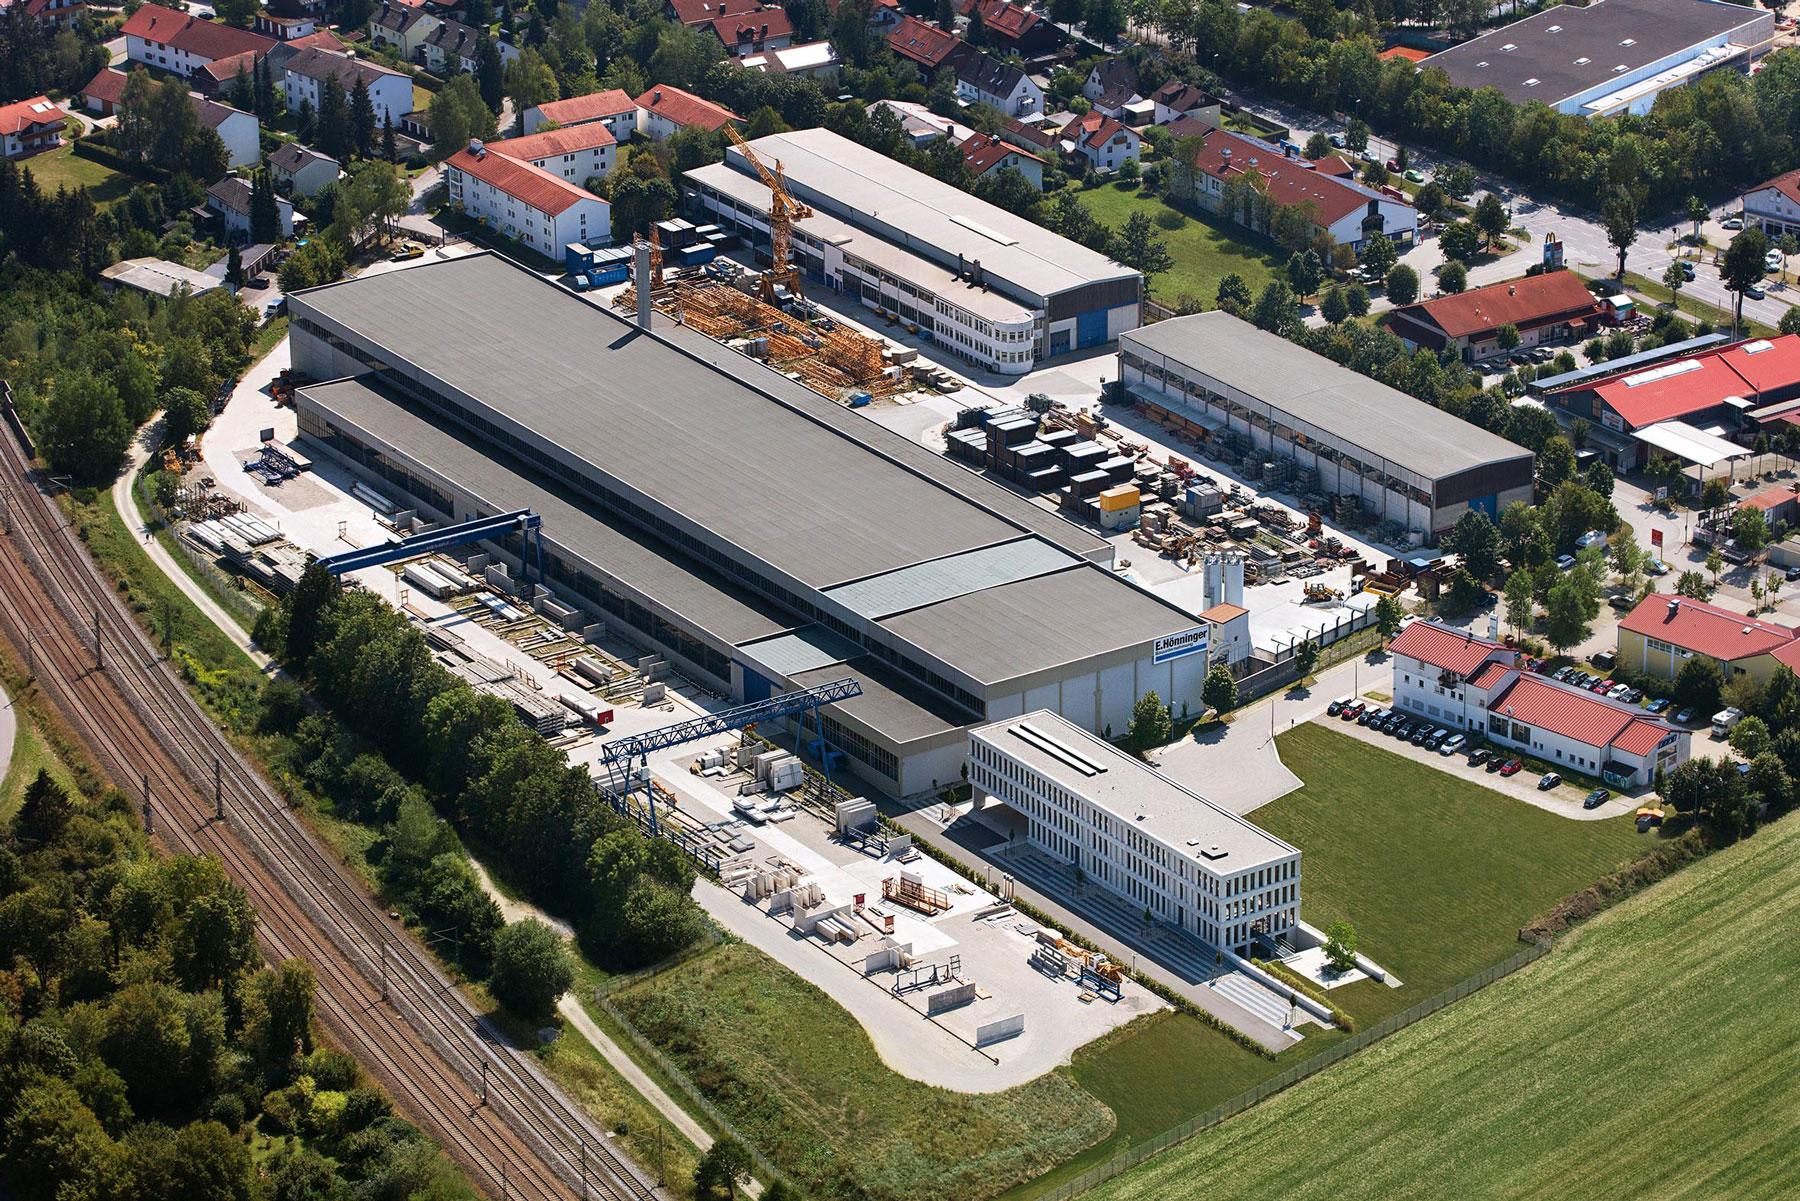 Hoenninger Zentrale Kirchseeon Luftaufnahme